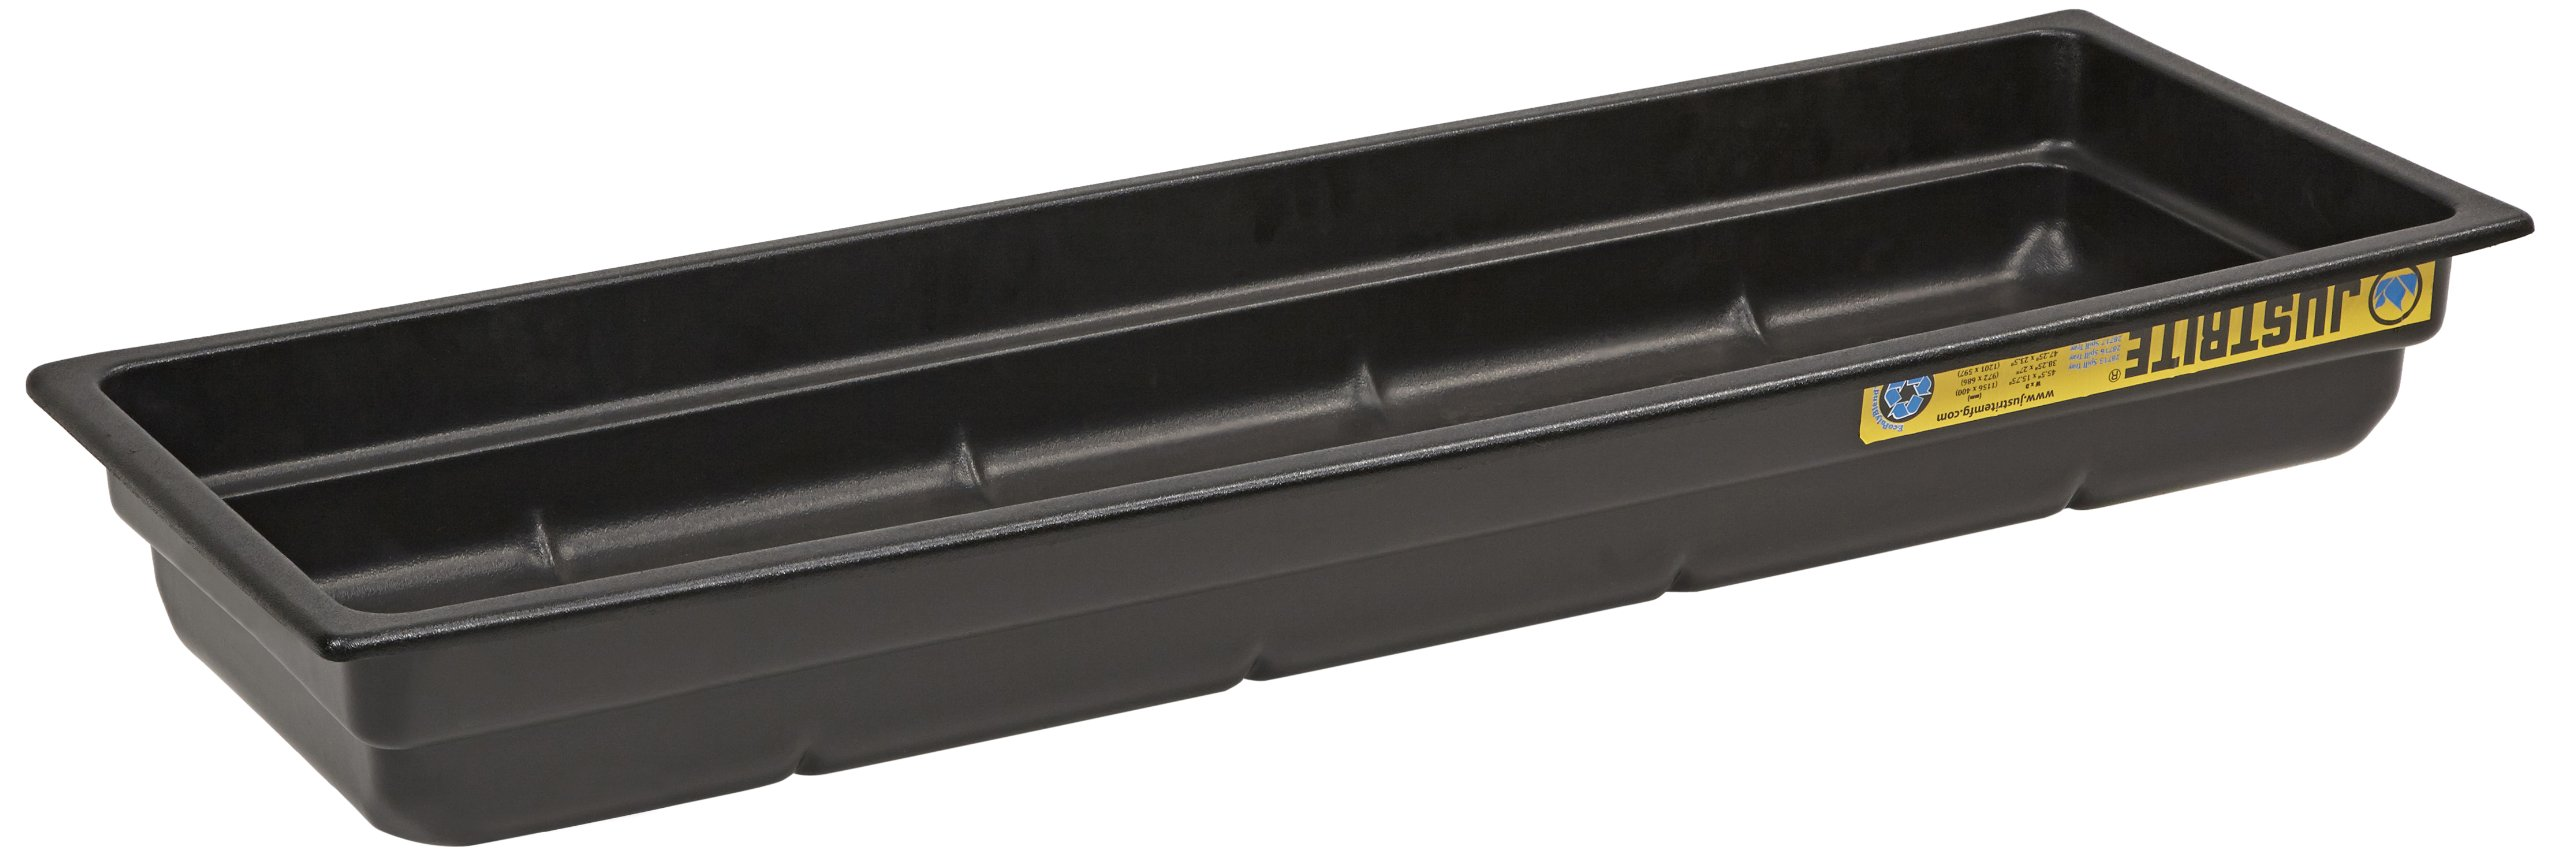 Justrite 28715 EcoPolyBlend Polyethylene Spill Tray, 46'' Width x 5-1/2'' Height x 16'' Depth, Green